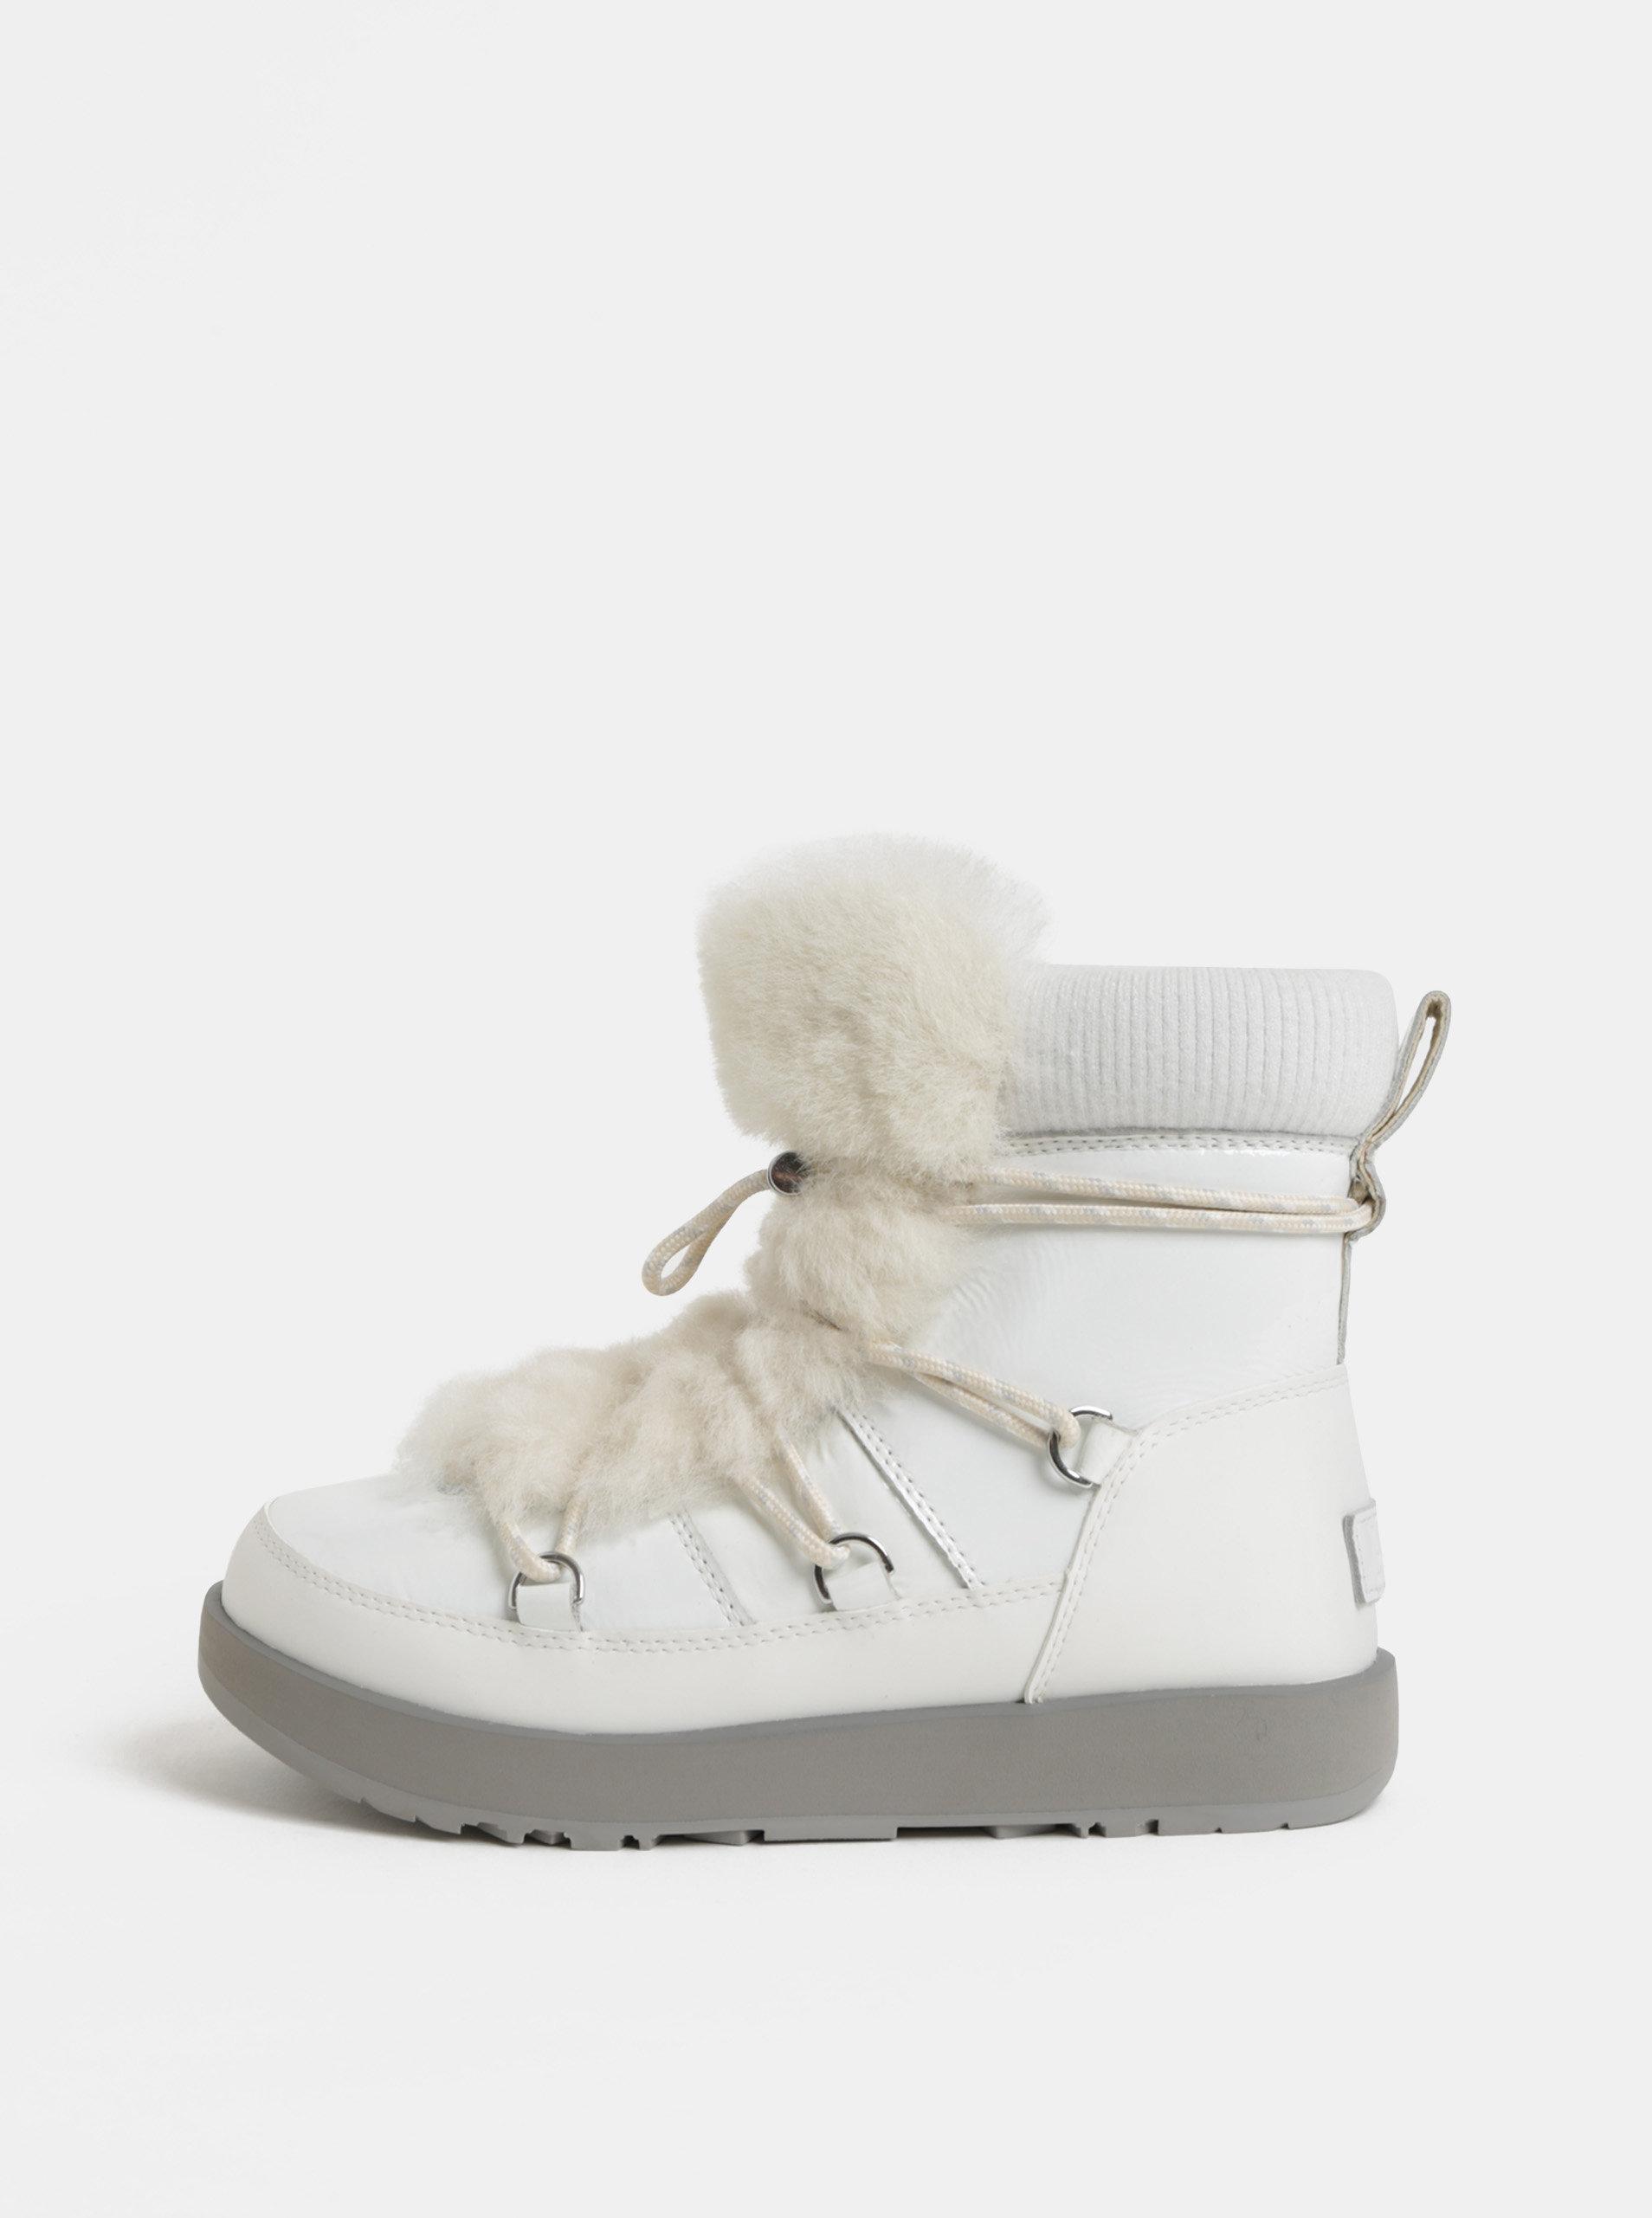 862d272d6d2a Biele nepremokavé kožené zimné topánky s umelou kožušinkou UGG Highland ...